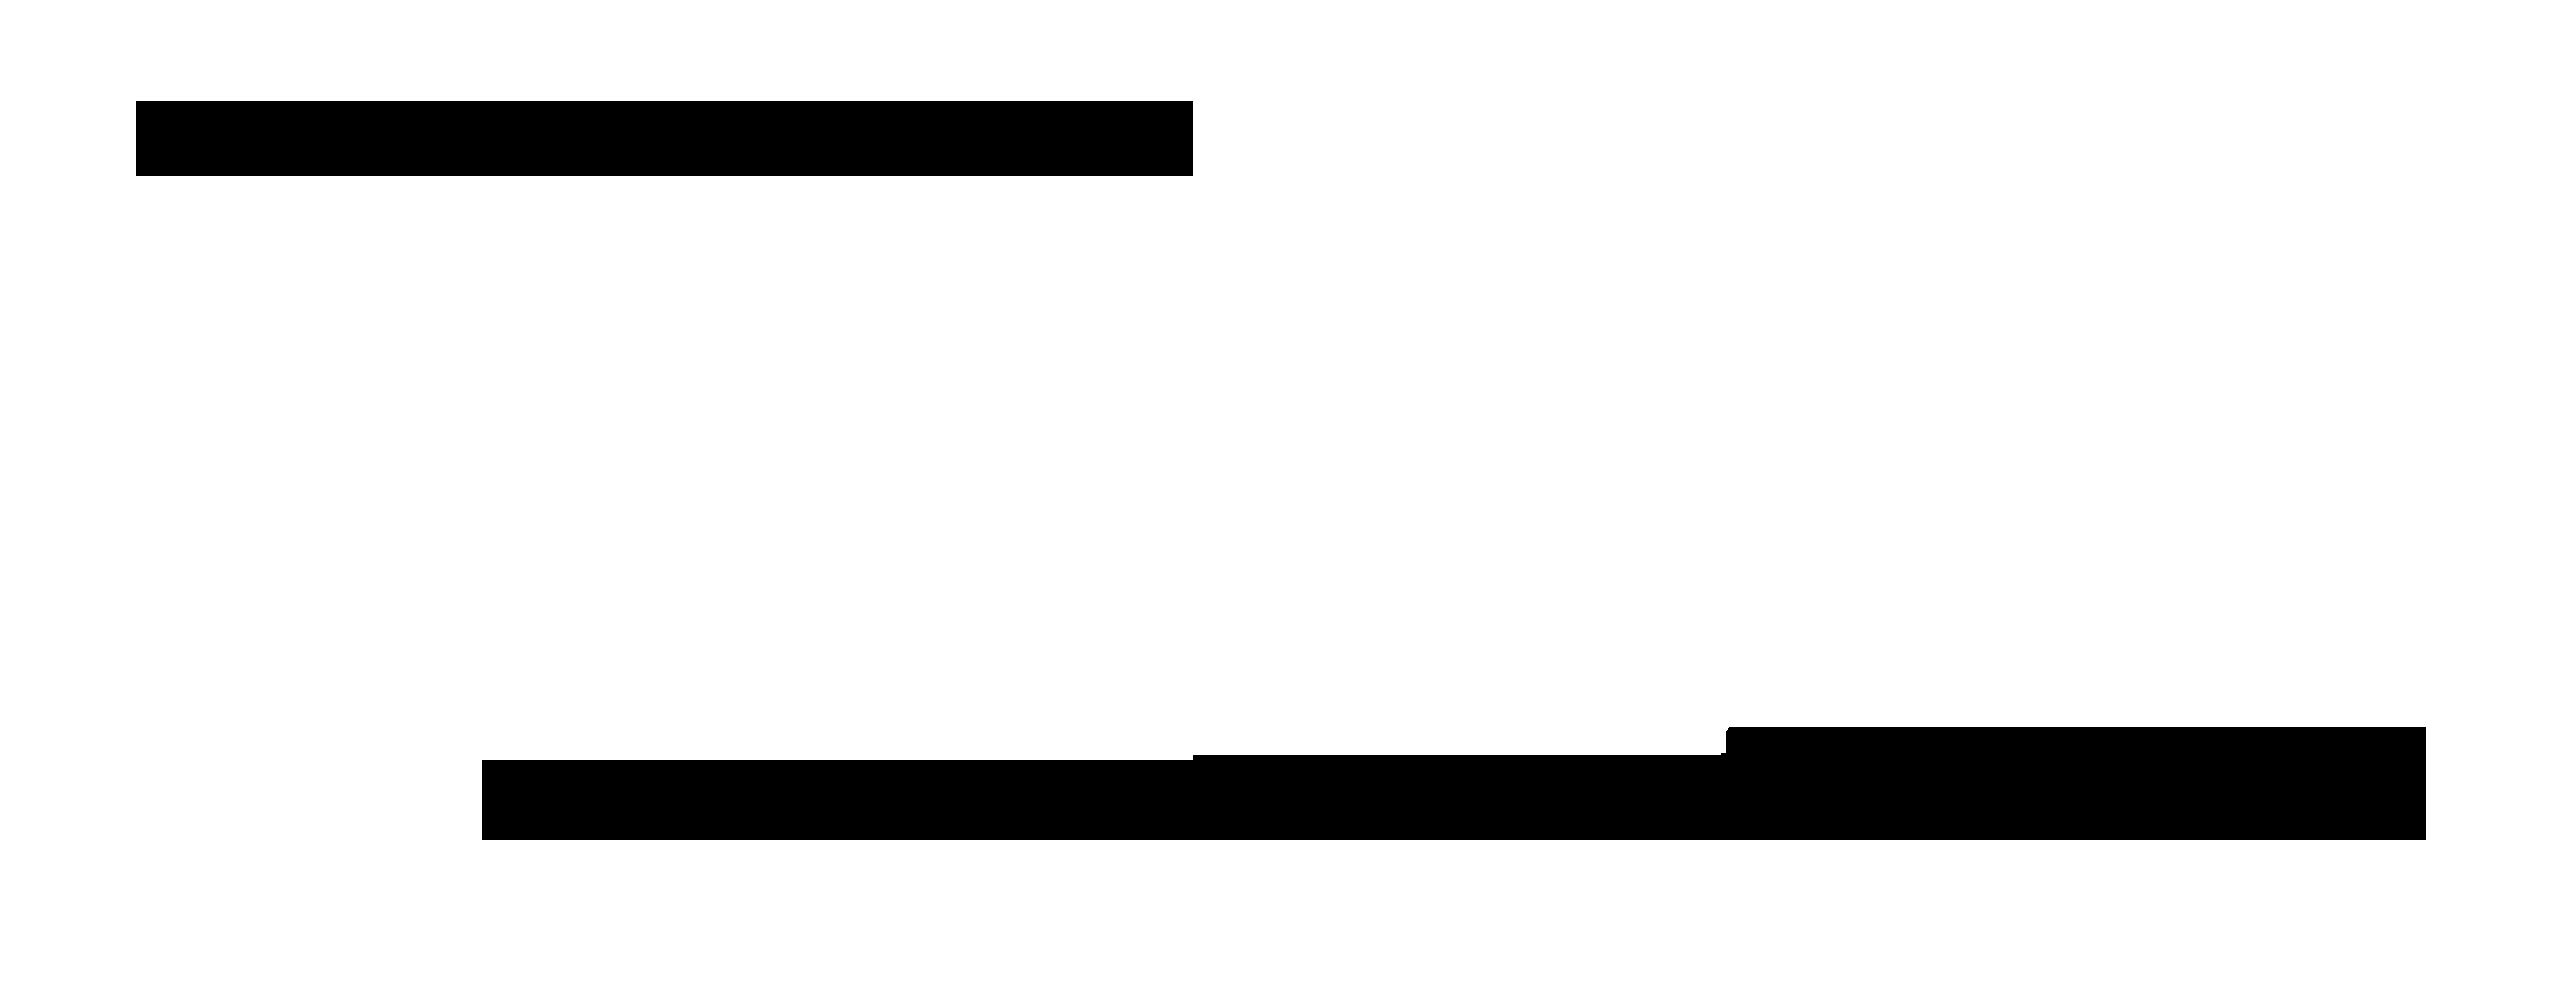 Michele Cammariere